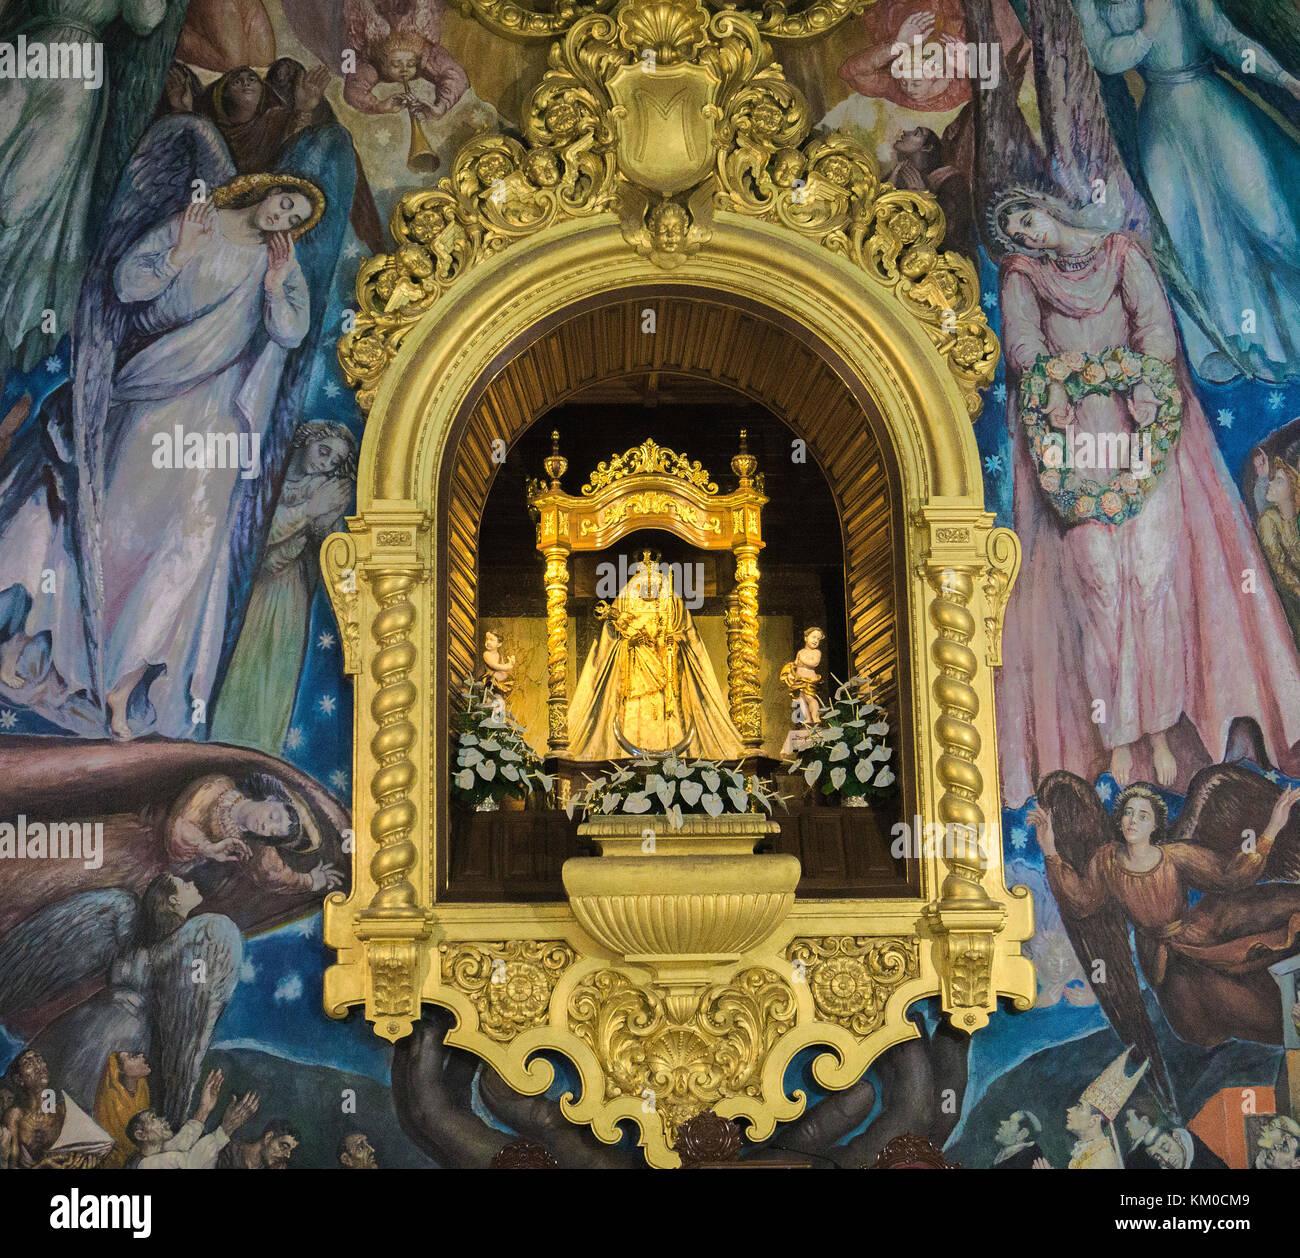 Virgin Maria, patron saint of Canary islands inside of Basilica de Nuestra Senora de Candelaria, Pilgrimage church - Stock Image